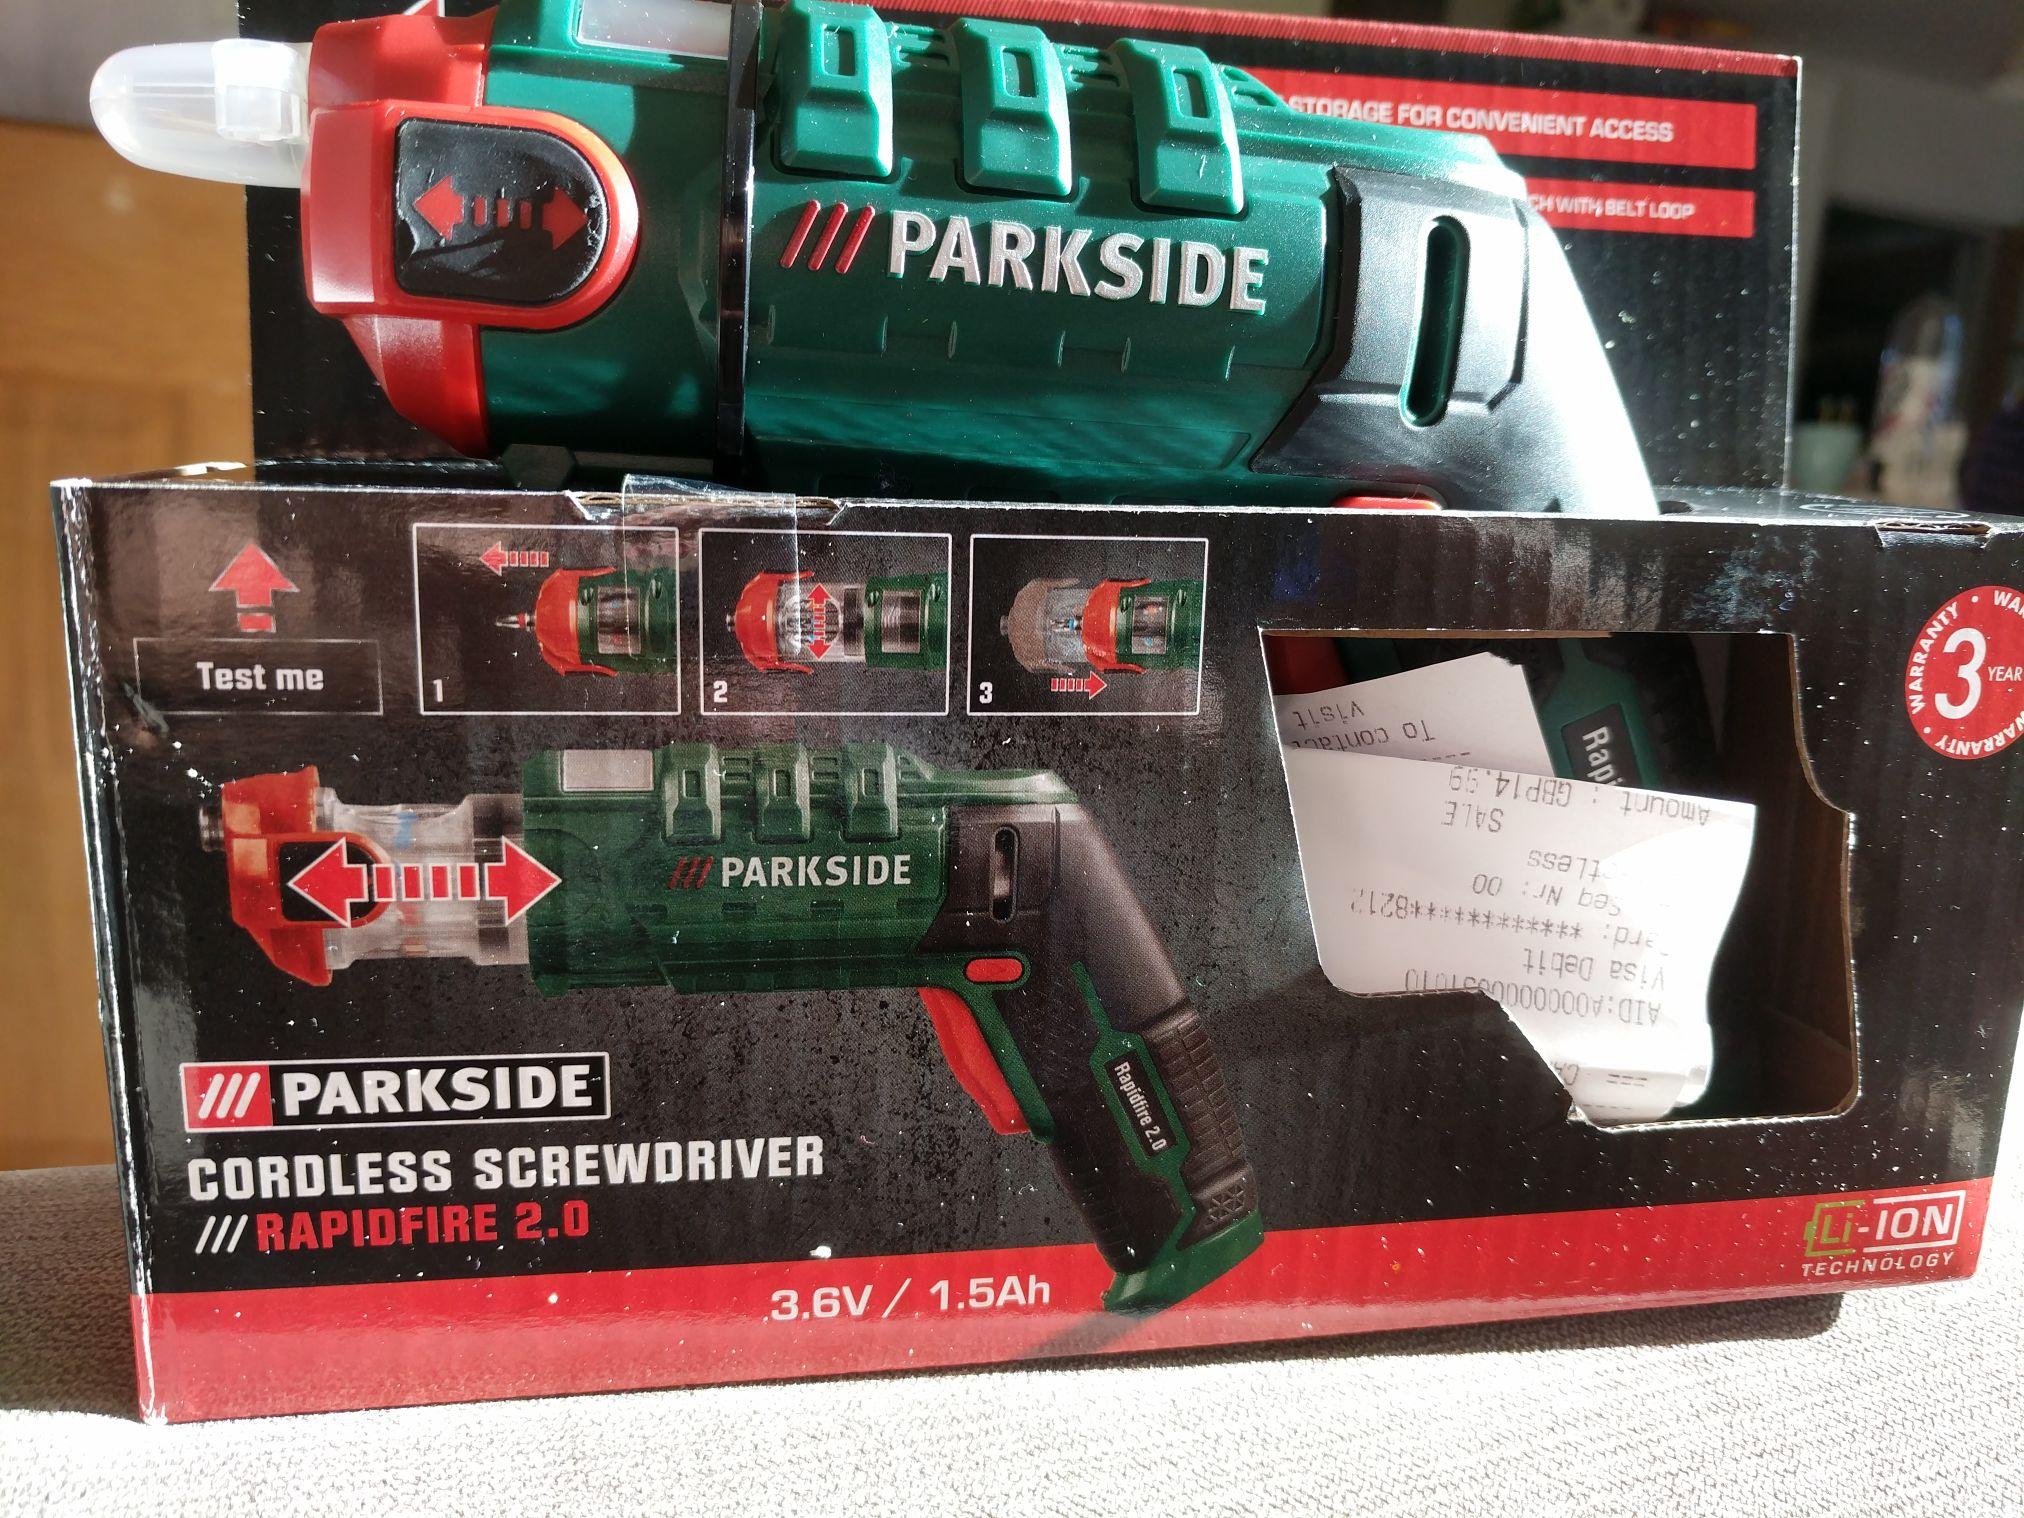 Lidl parkside cordless screwdriver 3.6v/1.5Ah with rapid fire integrated bit holder (holster included!!) £14.99 instore